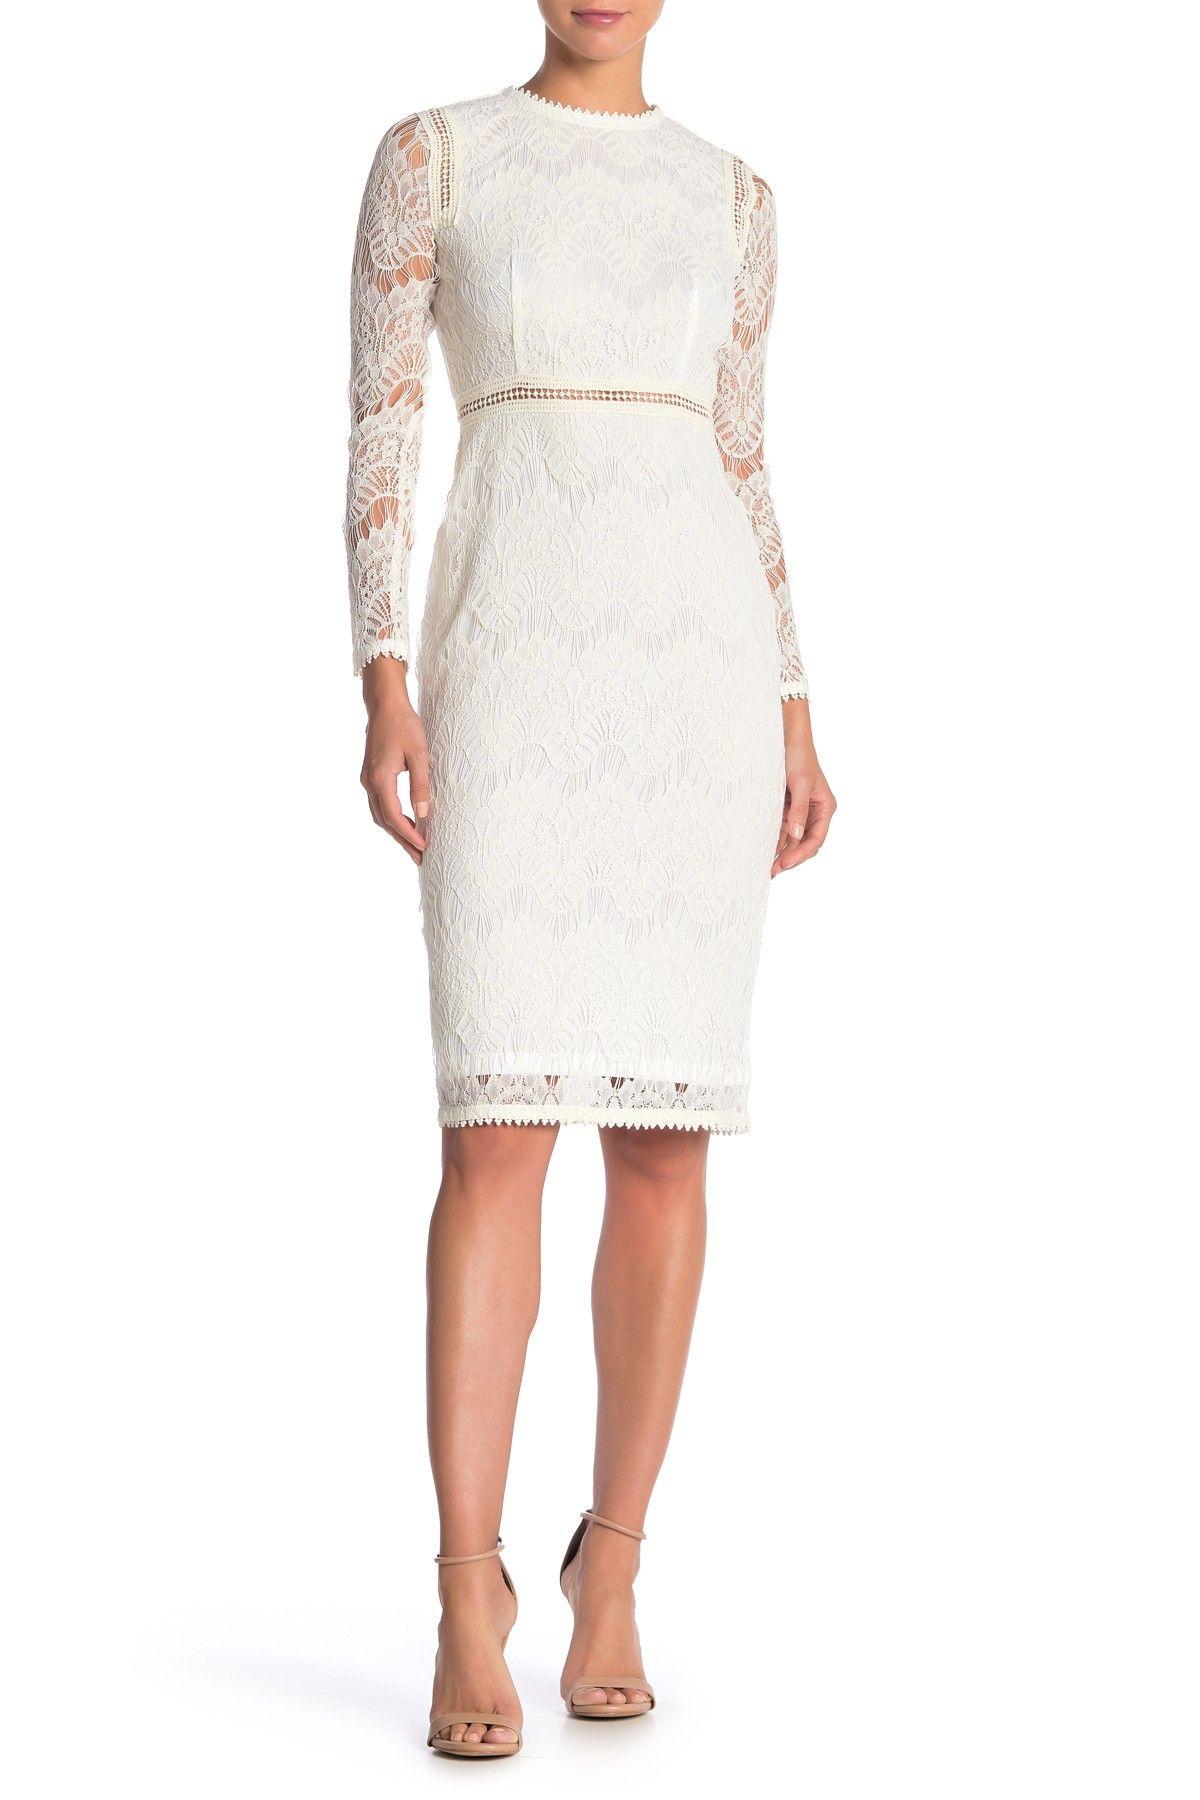 Love By Design Lace Long Sleeve Midi Dress Nordstrom Rack [ 1800 x 1200 Pixel ]